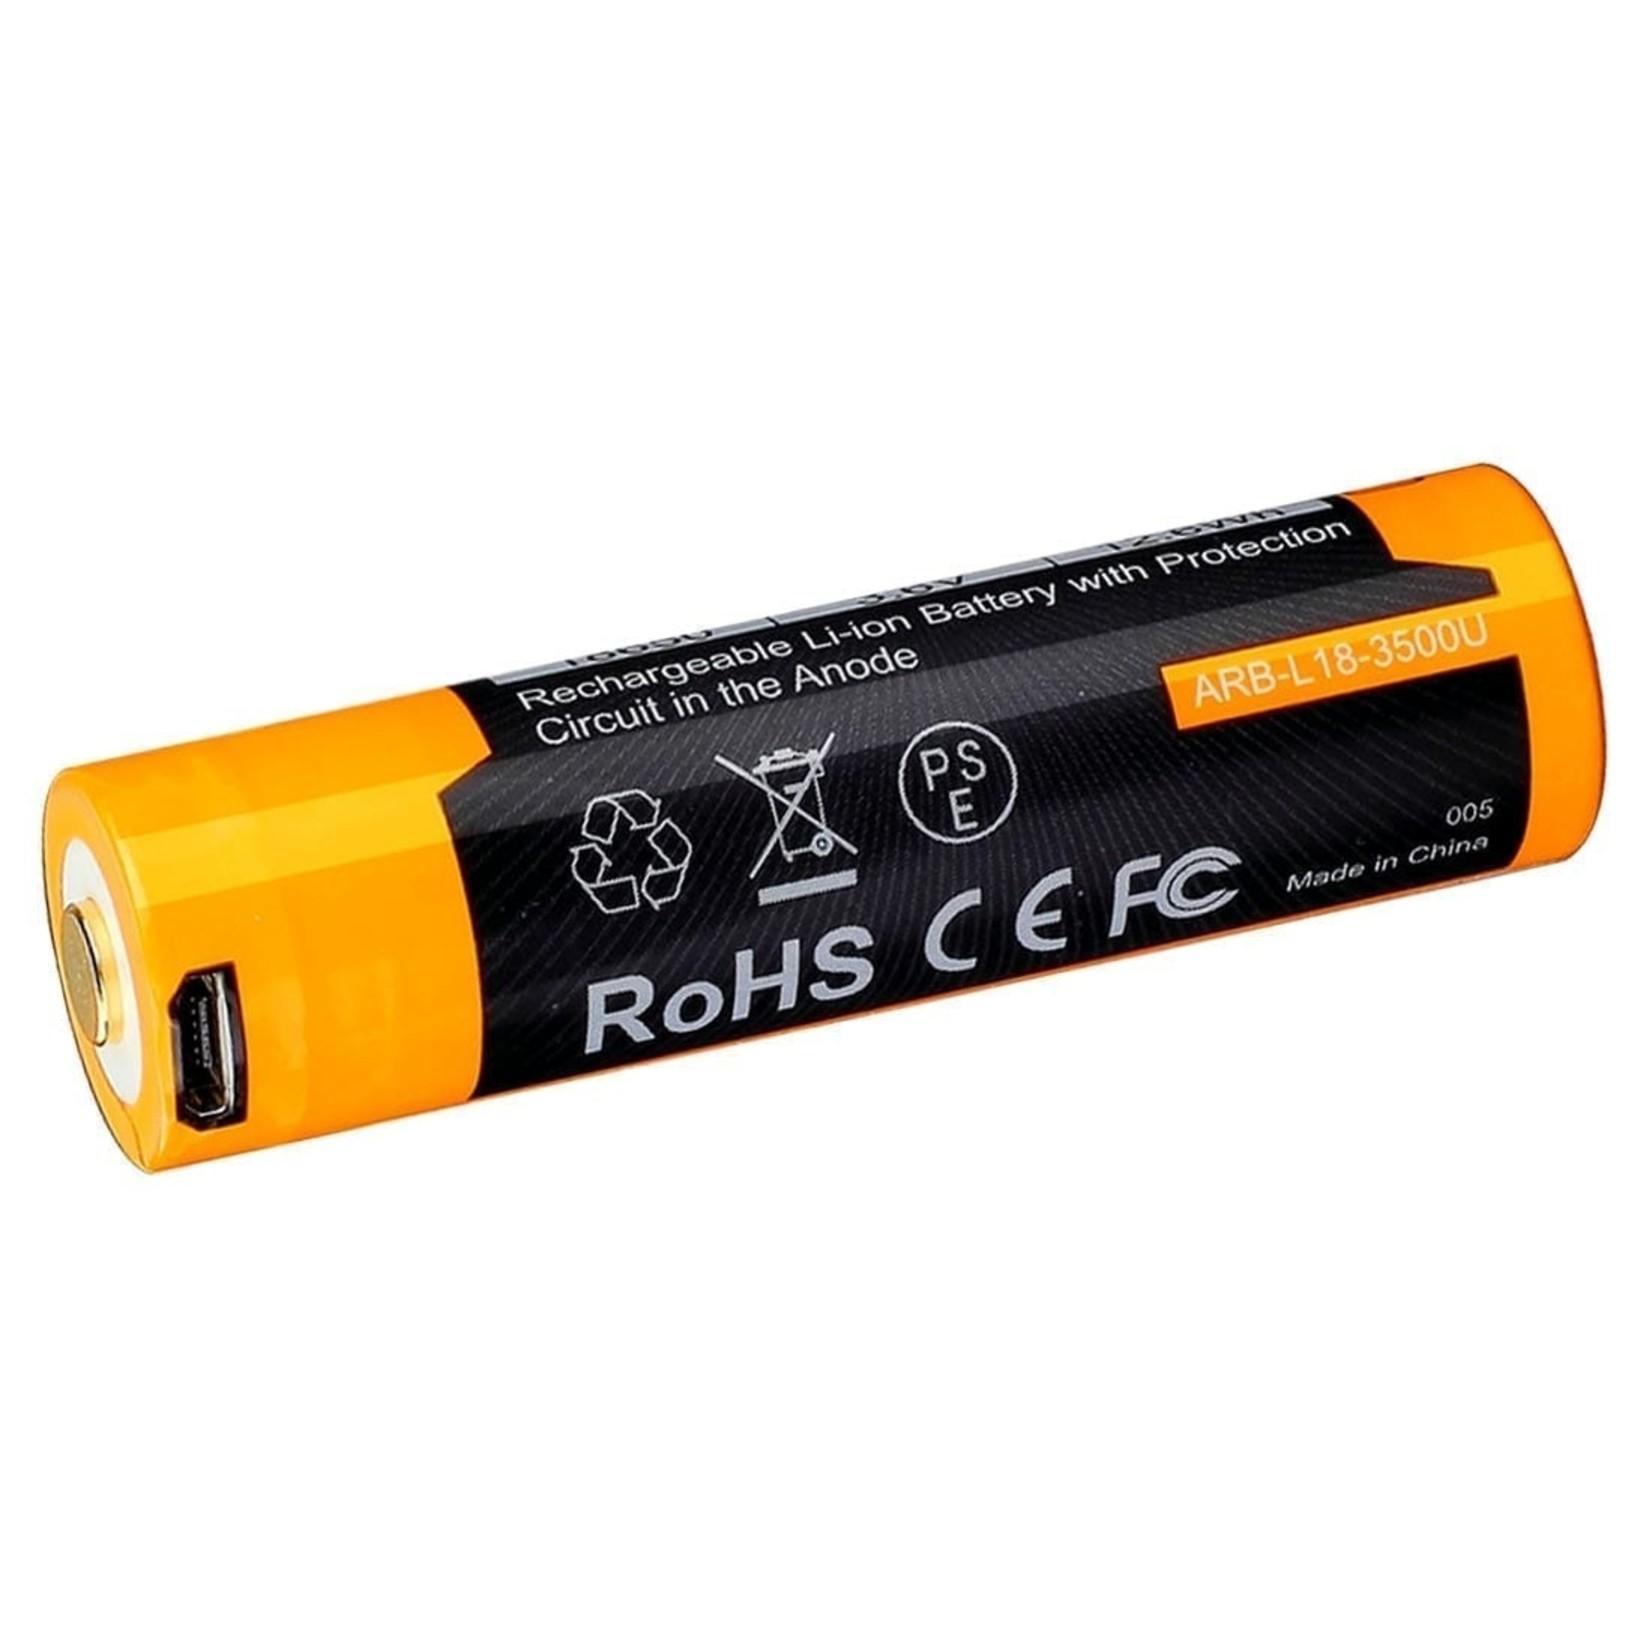 FENIX LIGHT FENIX ARB-L18-3500U BUILT-IN USB RECHARGEABLE BATTERY